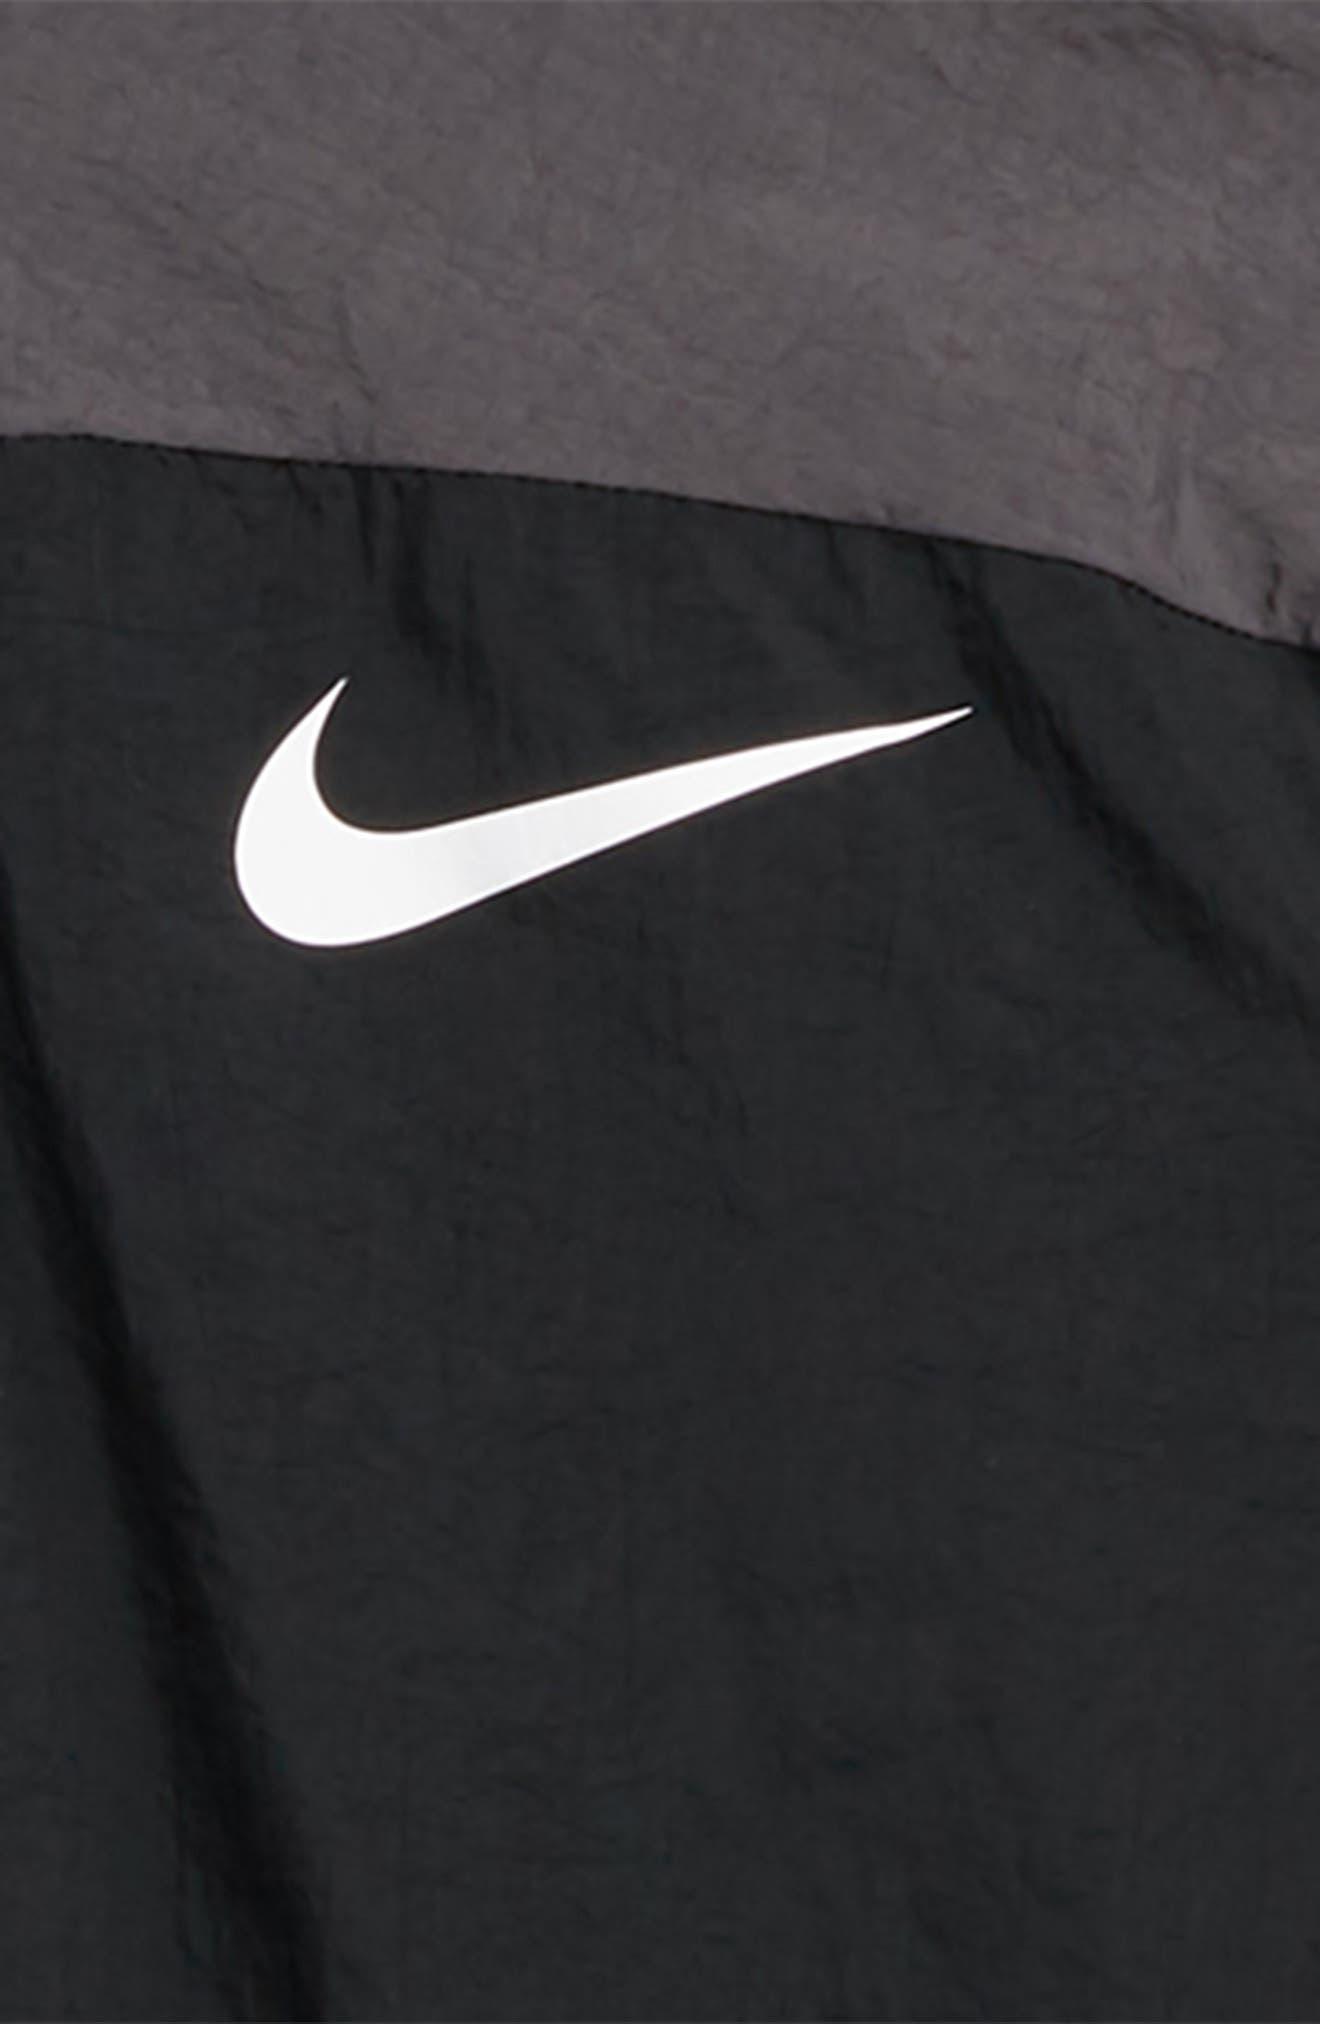 Dry Hooded Jacket,                             Alternate thumbnail 2, color,                             BLACK/ THUNDER GREY